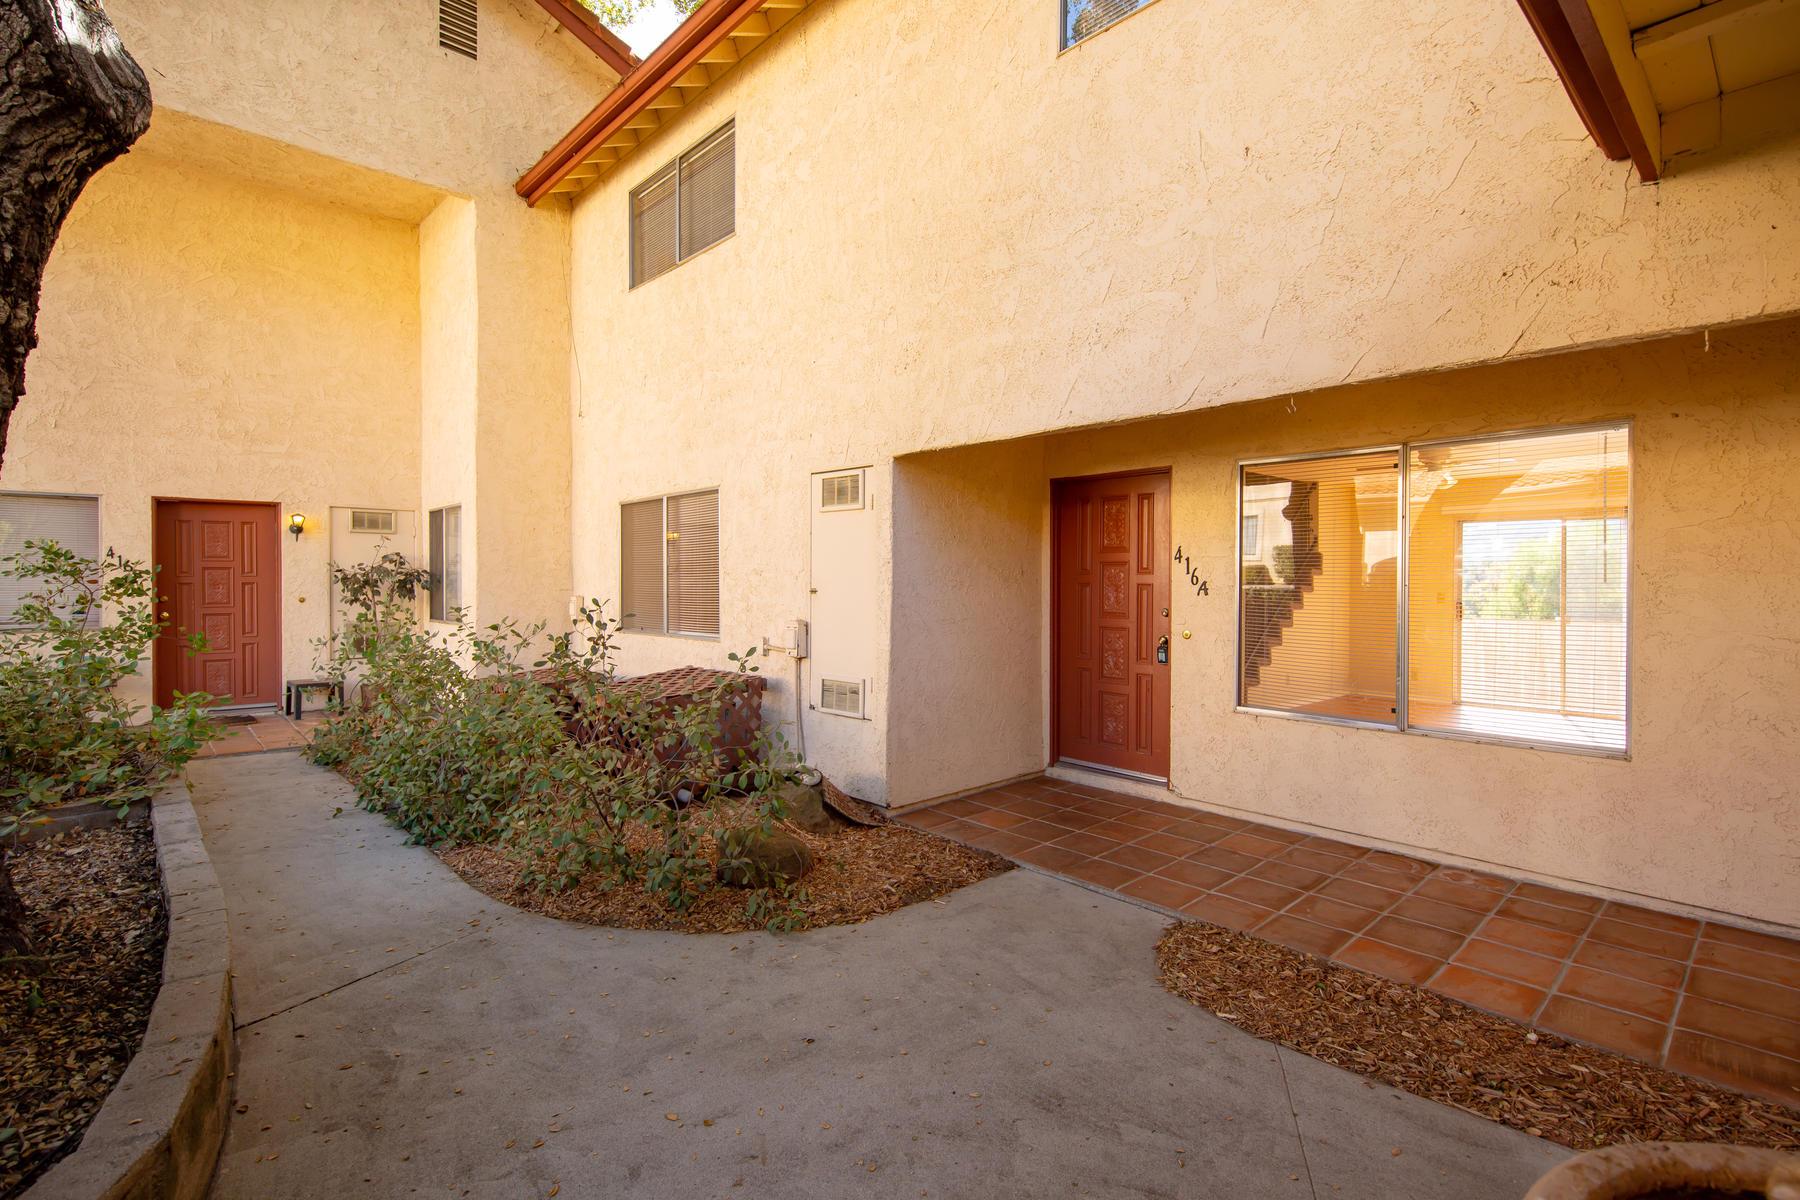 Duplex Homes 为 销售 在 Spacious Ojai Duplex 416 South Ventura Street 奥海镇, 加利福尼亚州 93023 美国